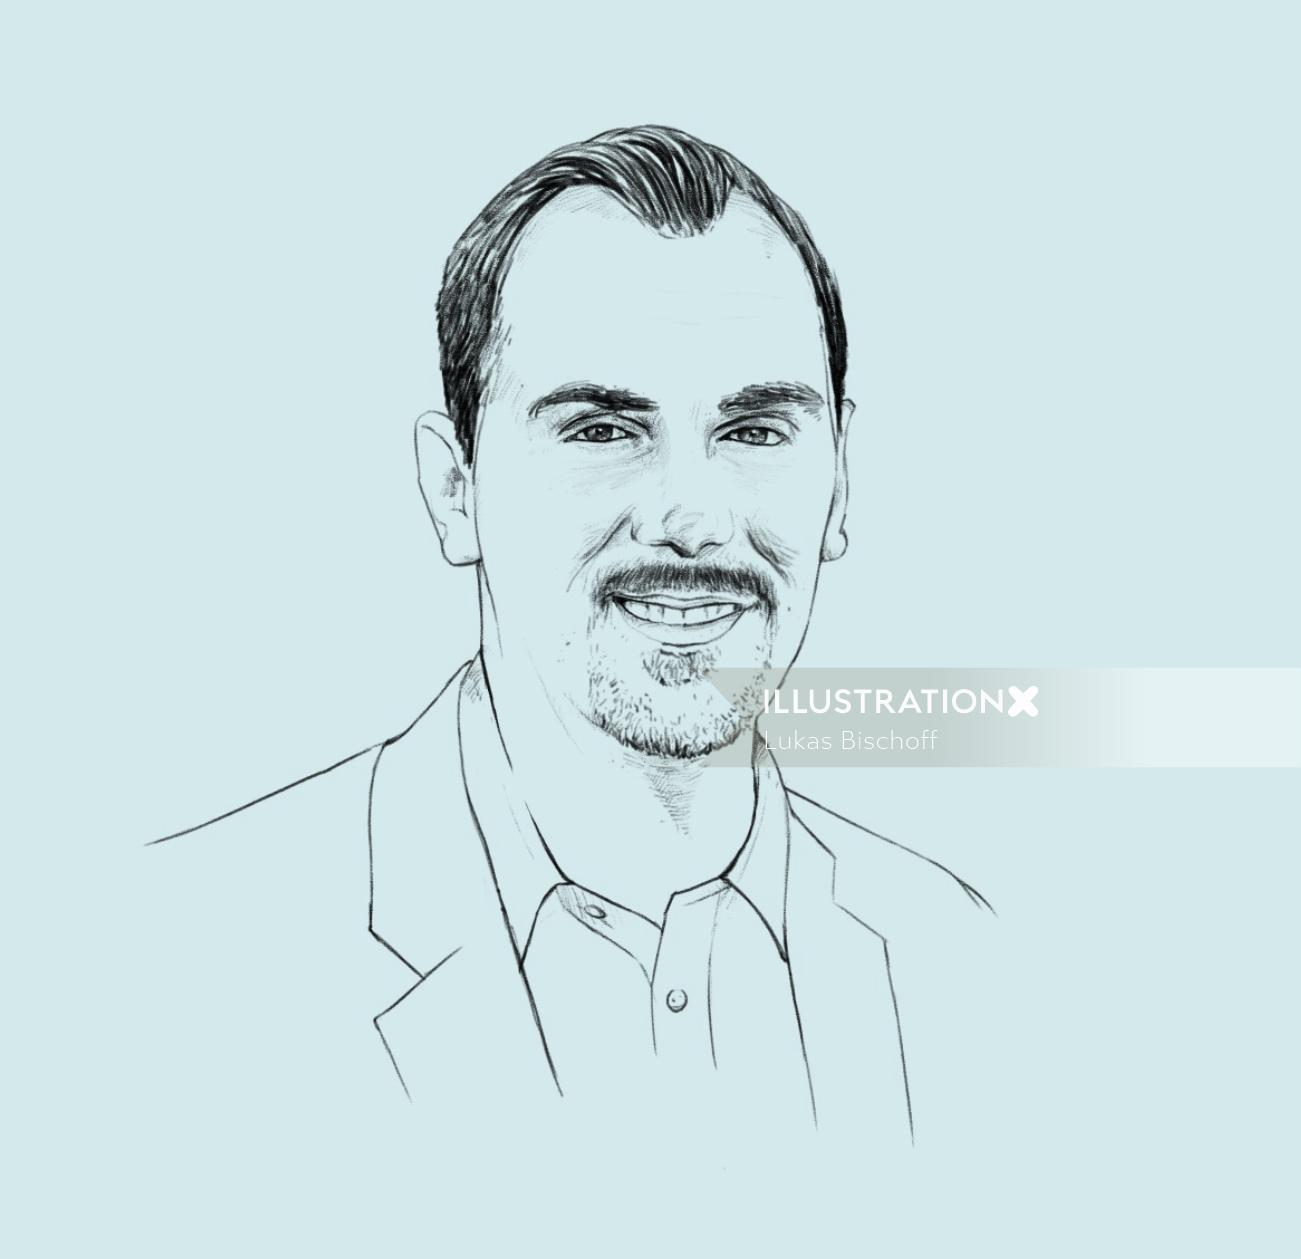 loose portrait illustration of man